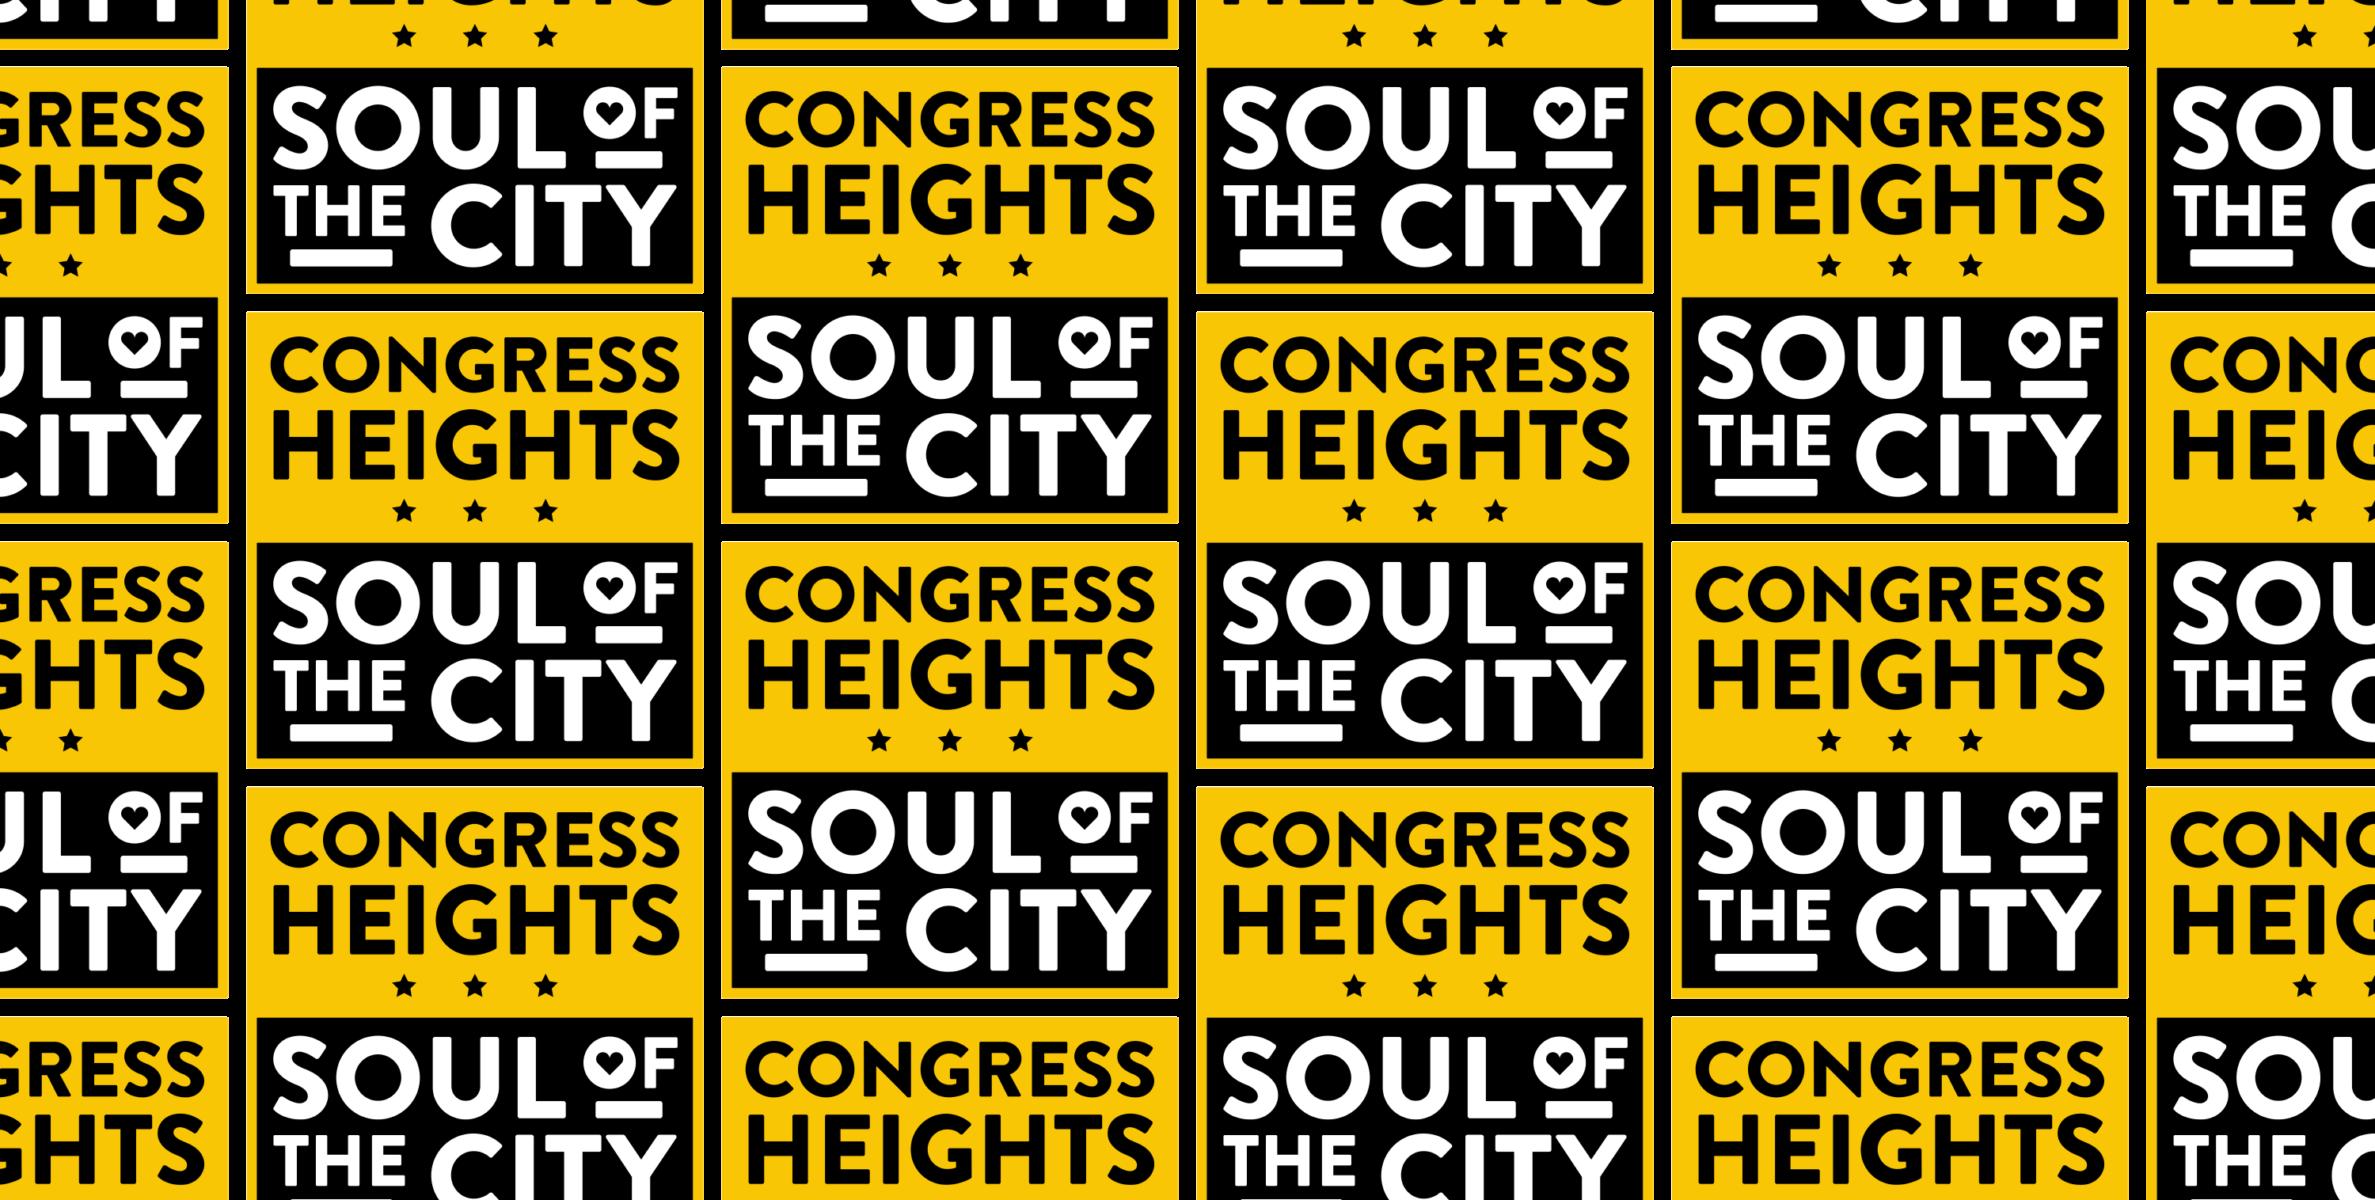 CongressHeights_lotsa_logos_RGB